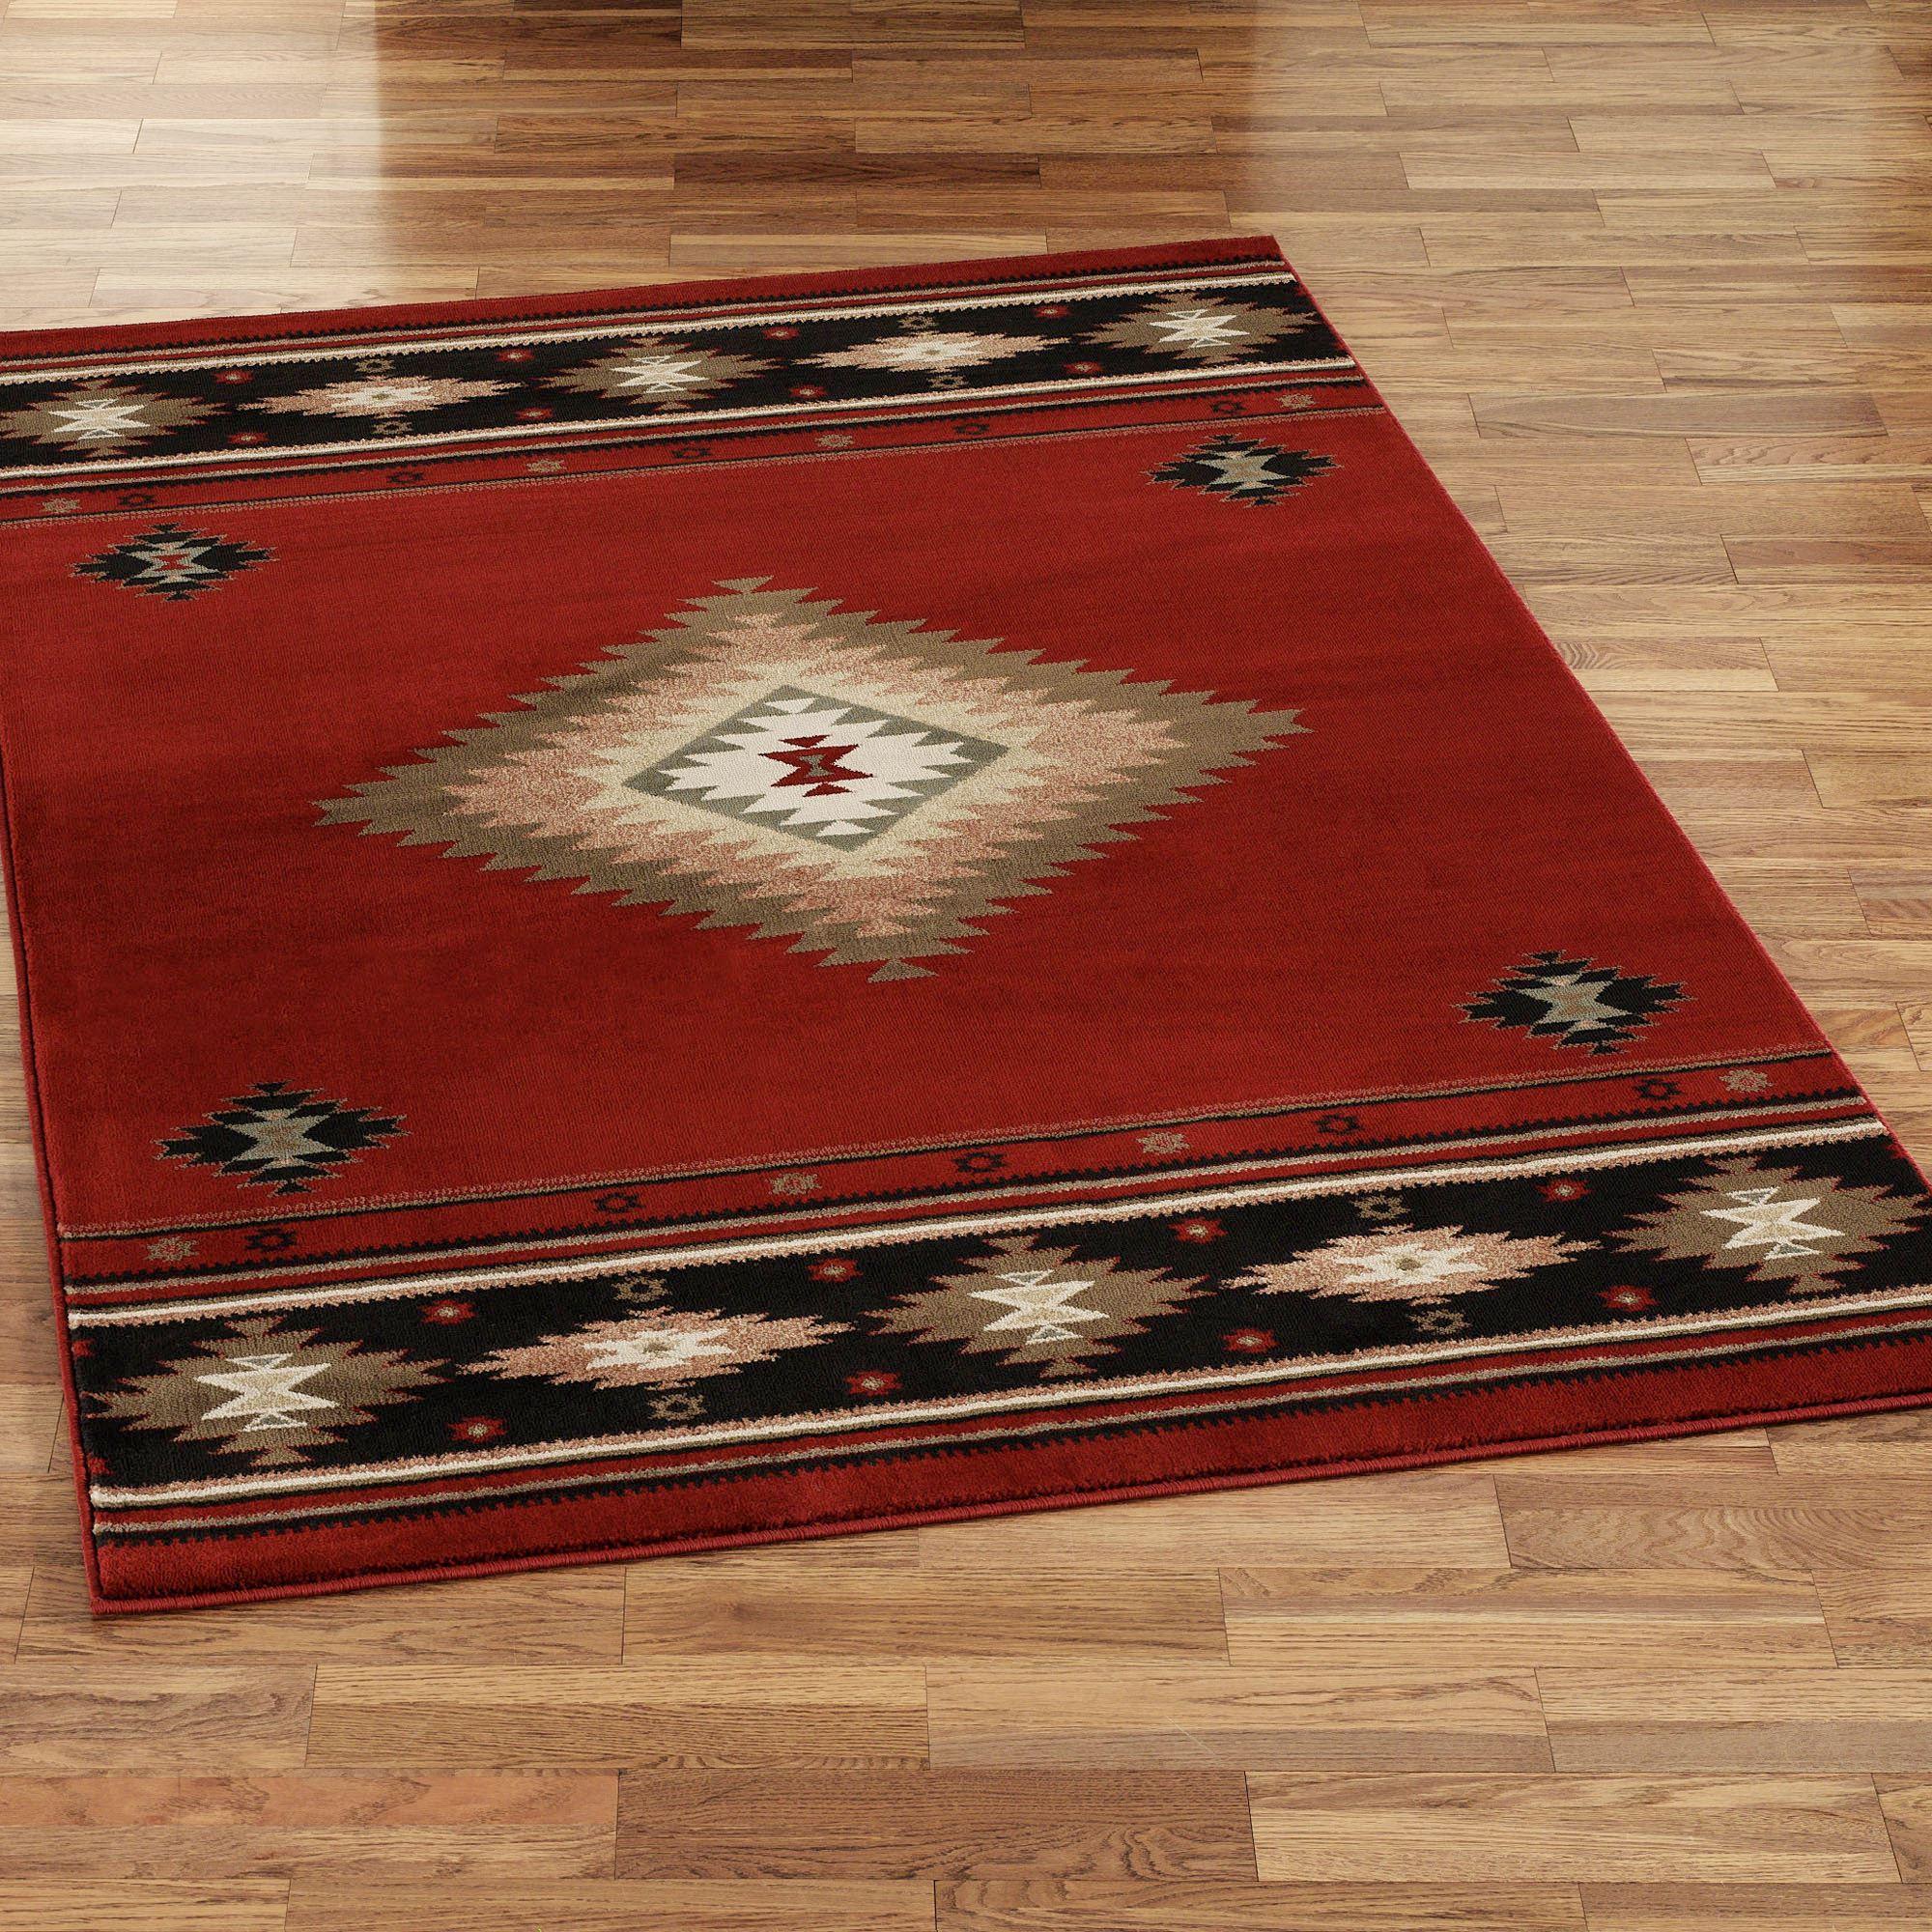 area rugs southwestern design - rug designs